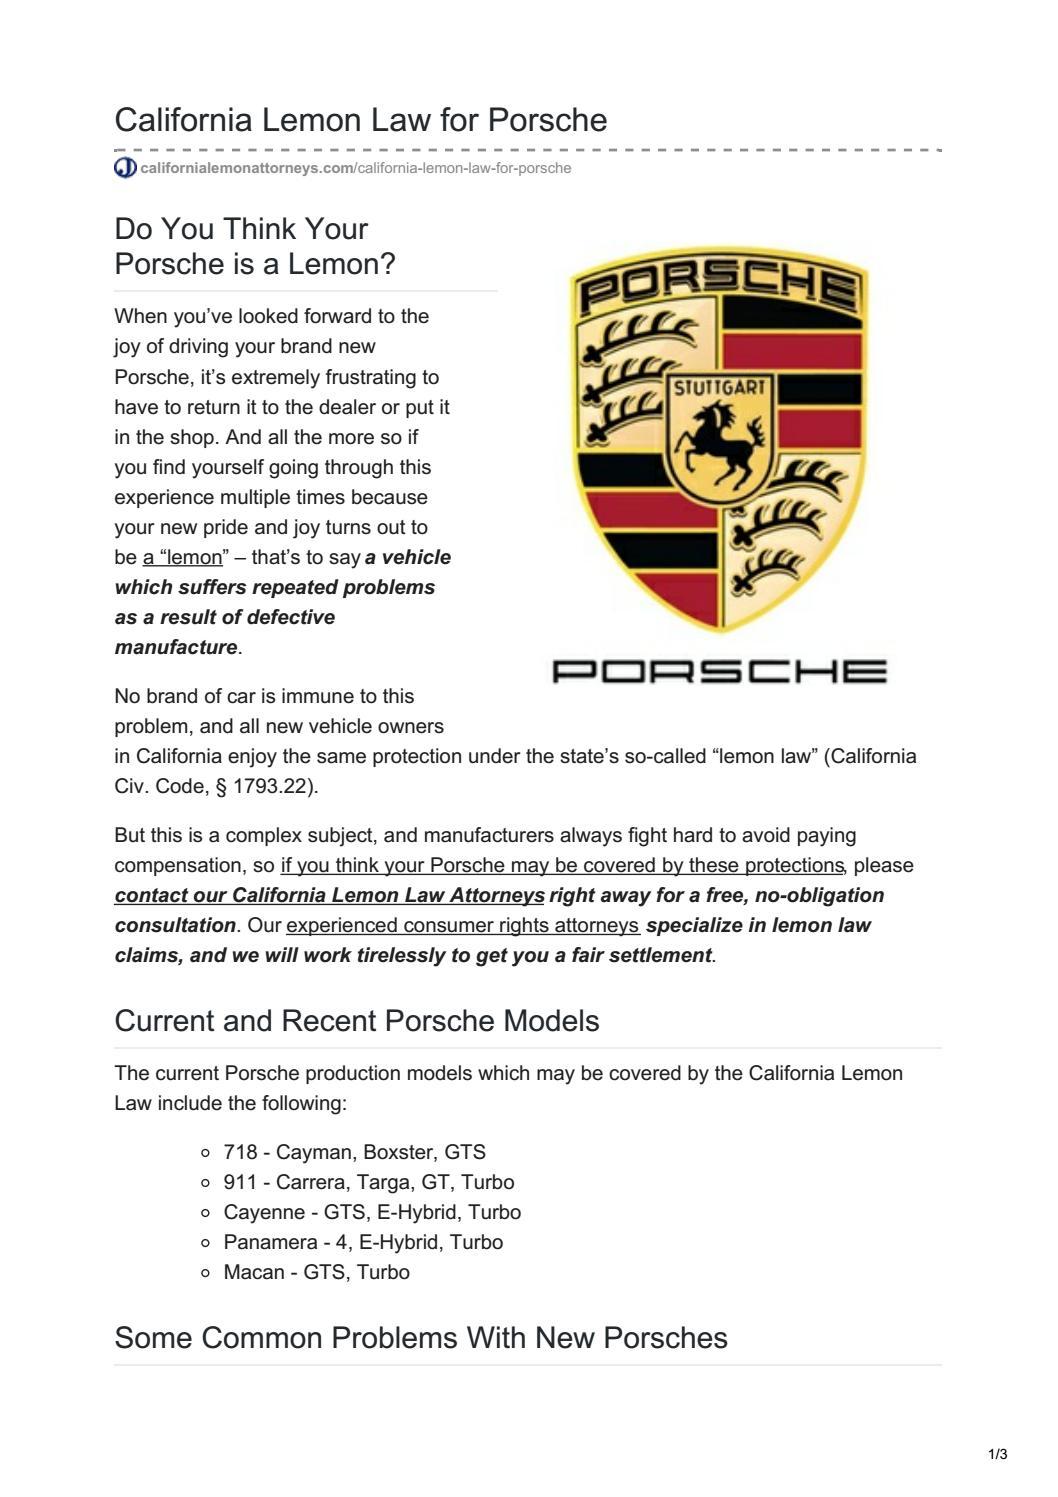 California Lemon Law >> California Lemon Law For Porsche By California Lemon Attorneys Issuu